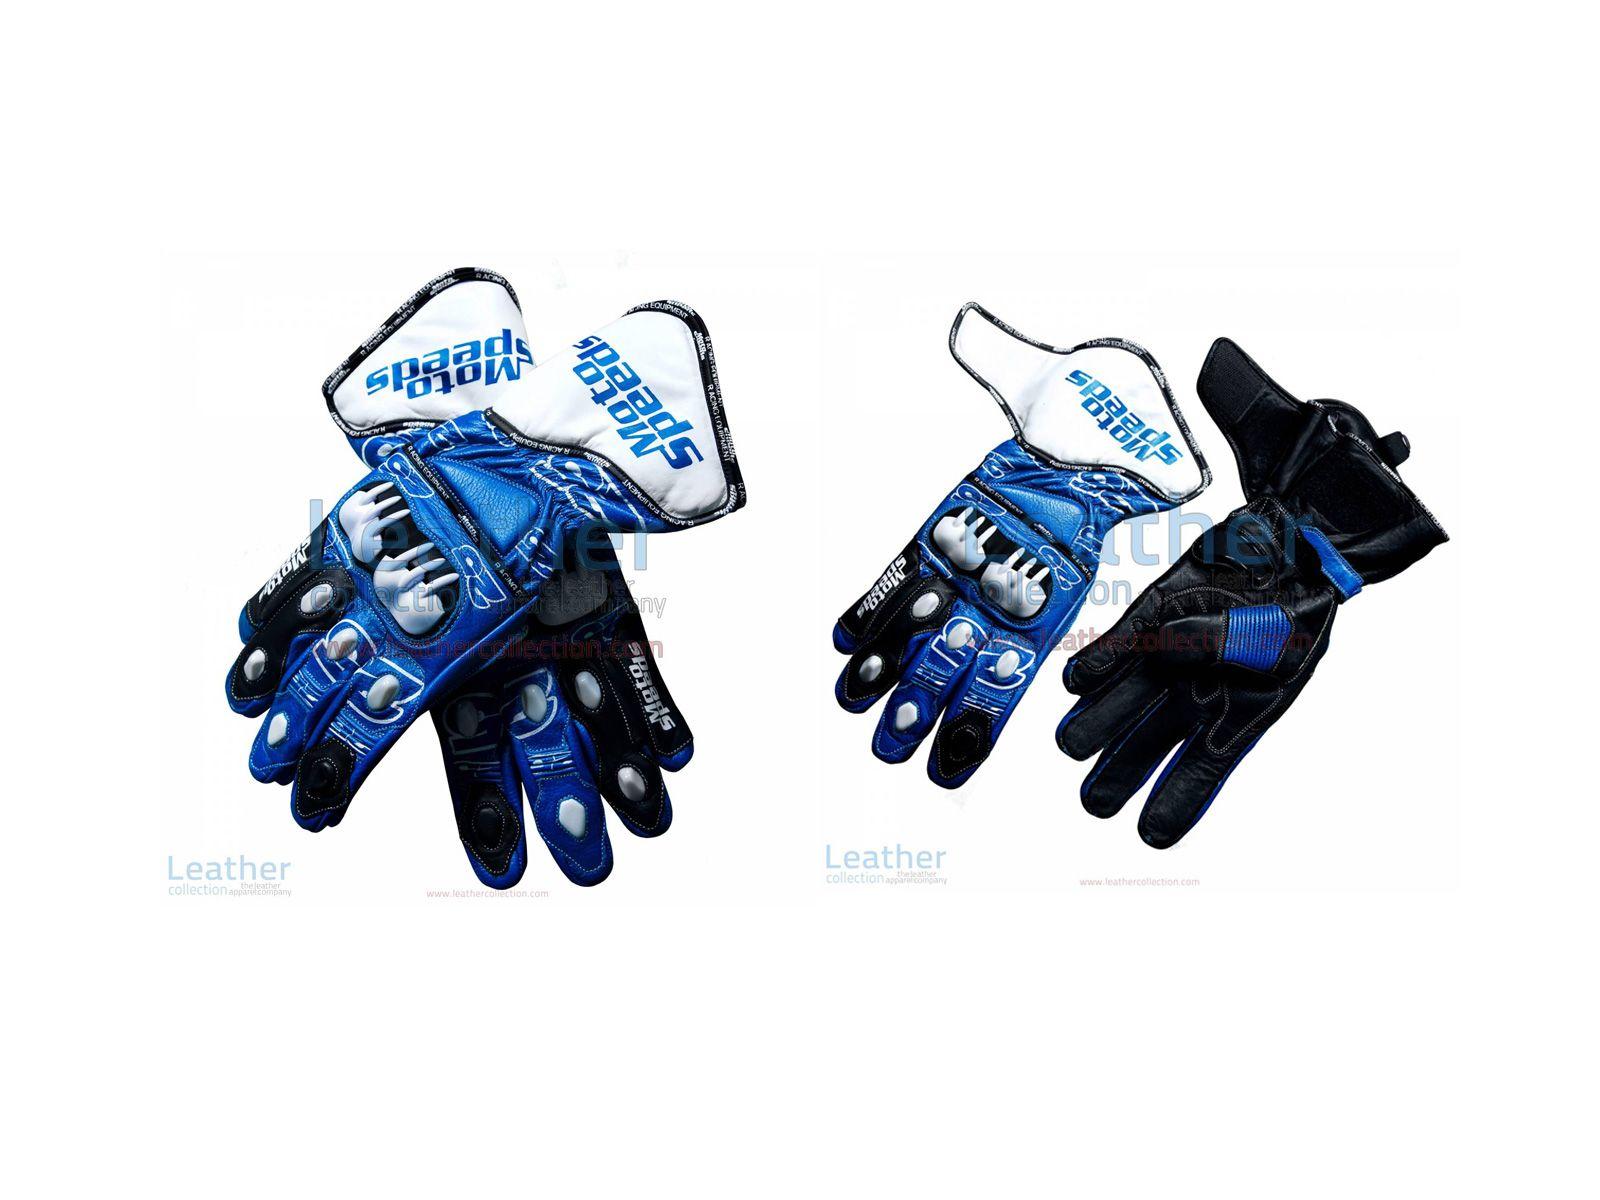 Maverick Vinales Suzuki Motogp 2015 Gloves Https Leathercollection Com Wp 2018 09 20 Maverick Vinales Suzuki Motogp 2 Motogp Motorcycle Leathers Suit Suzuki